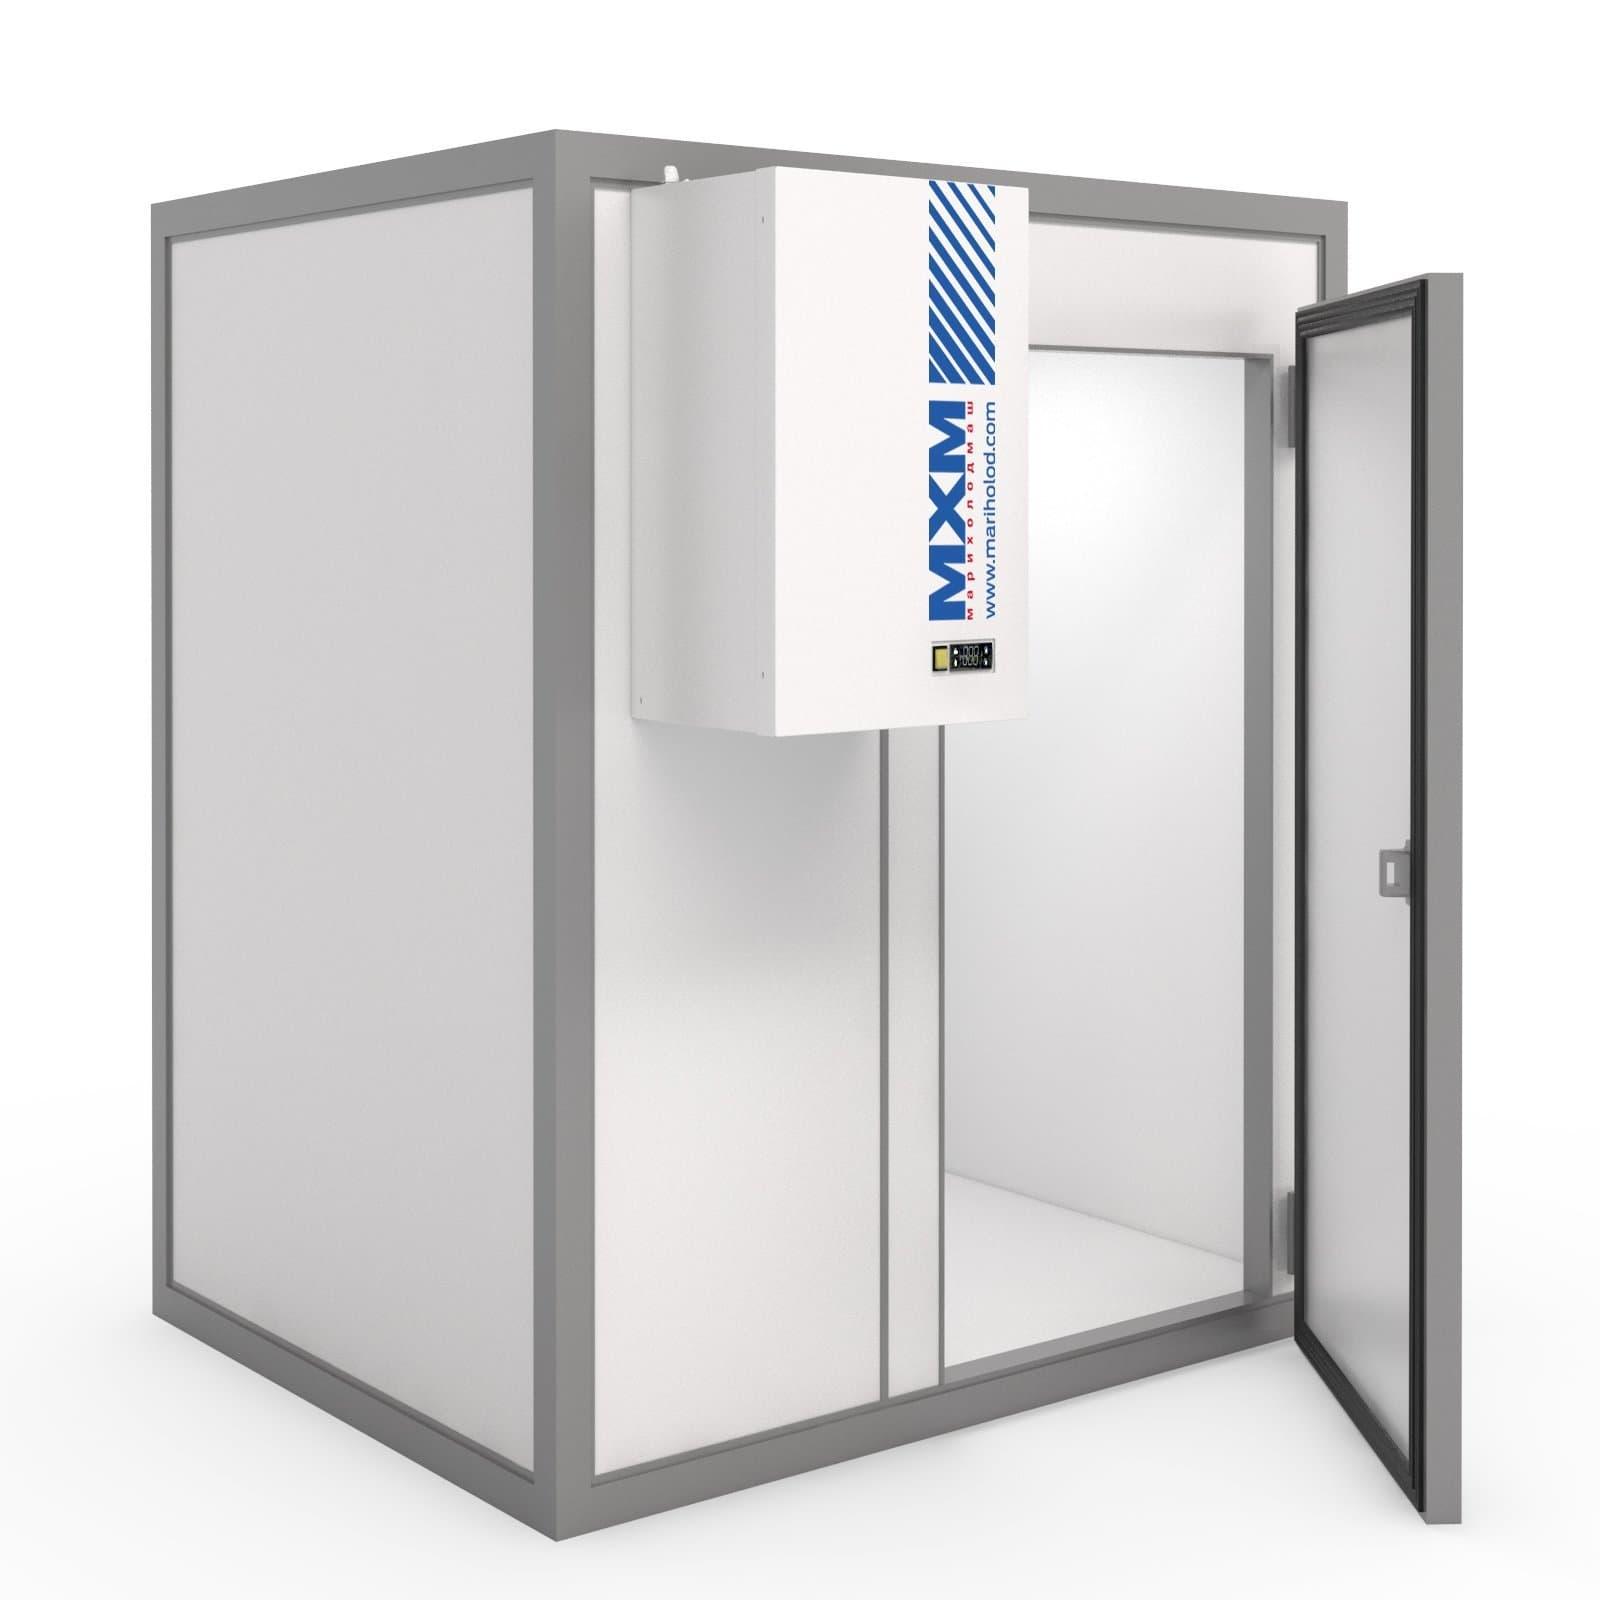 Камера холодильная МХМ КХН-43,70 2260×10360×2200